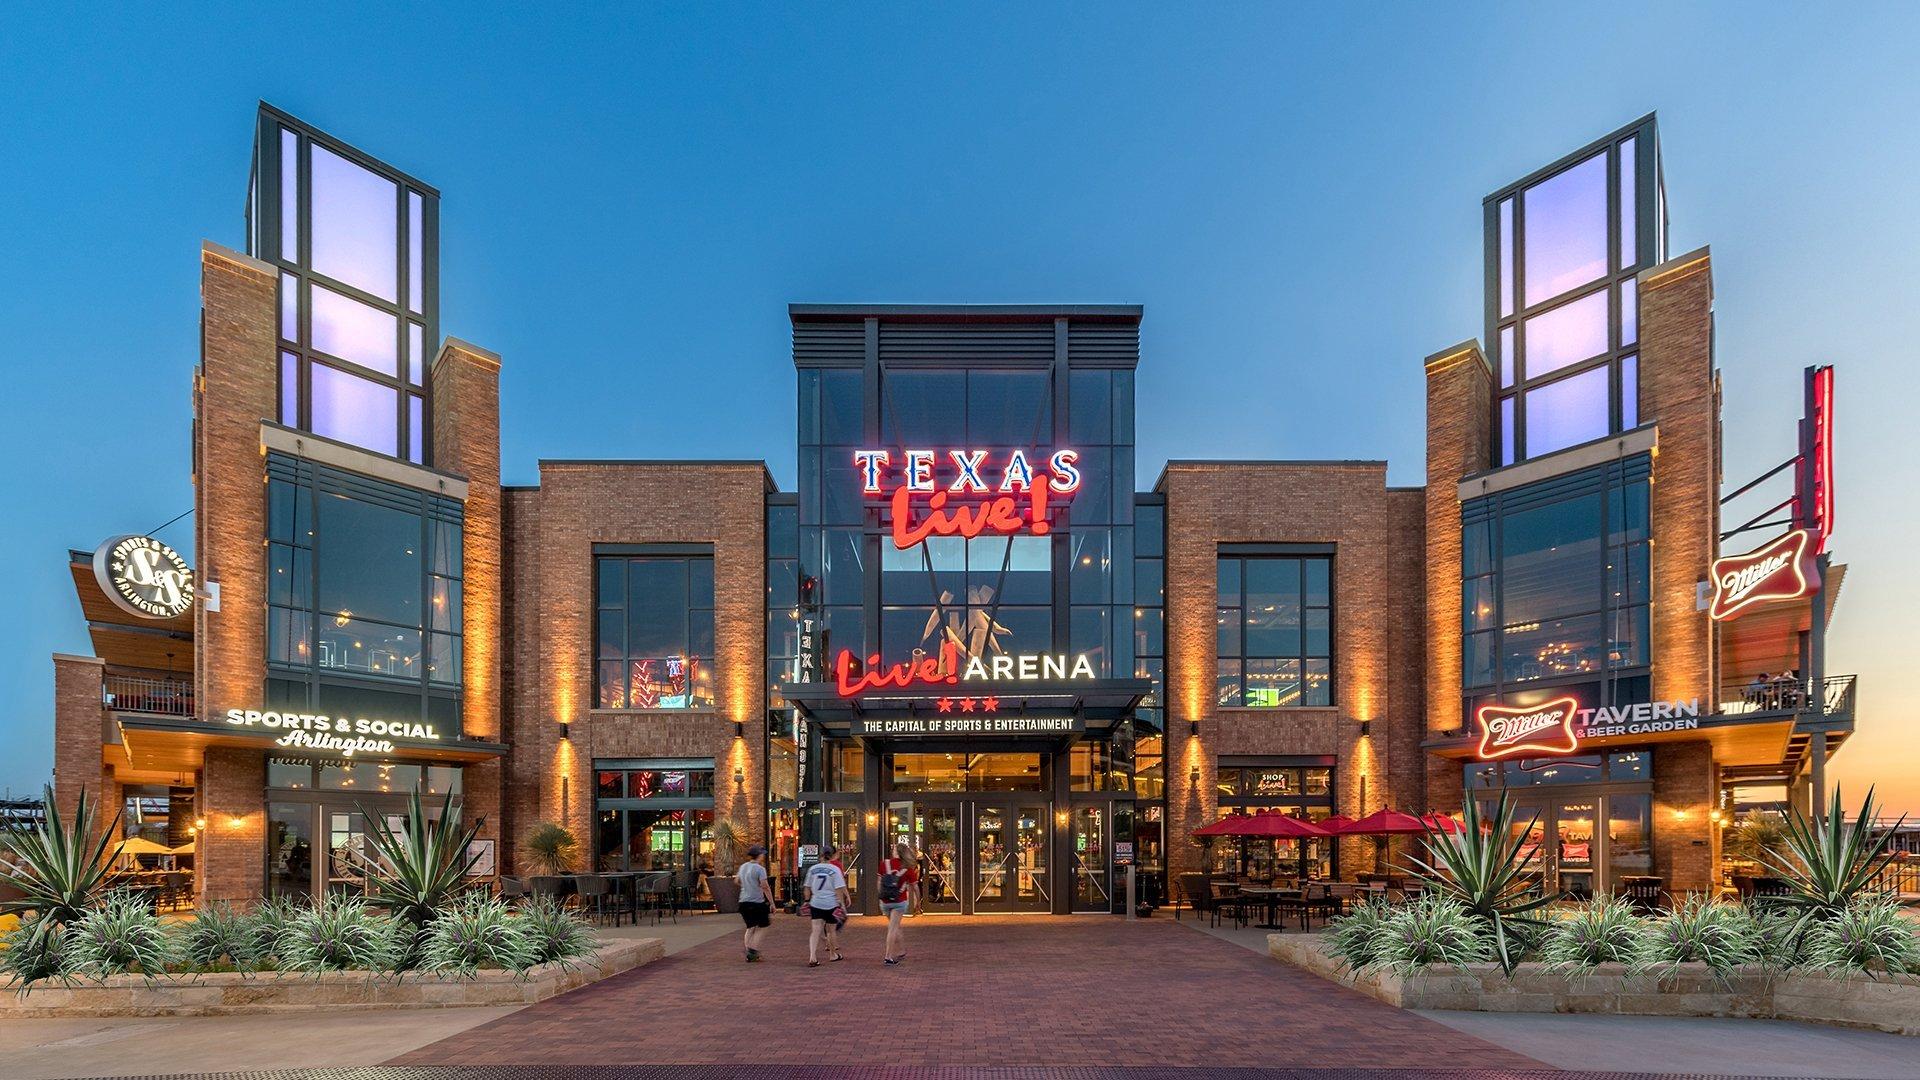 Texas Live Hord Coplan Macht Texas has enough hidden places and secret spots to explore for a lifetime. texas live hord coplan macht